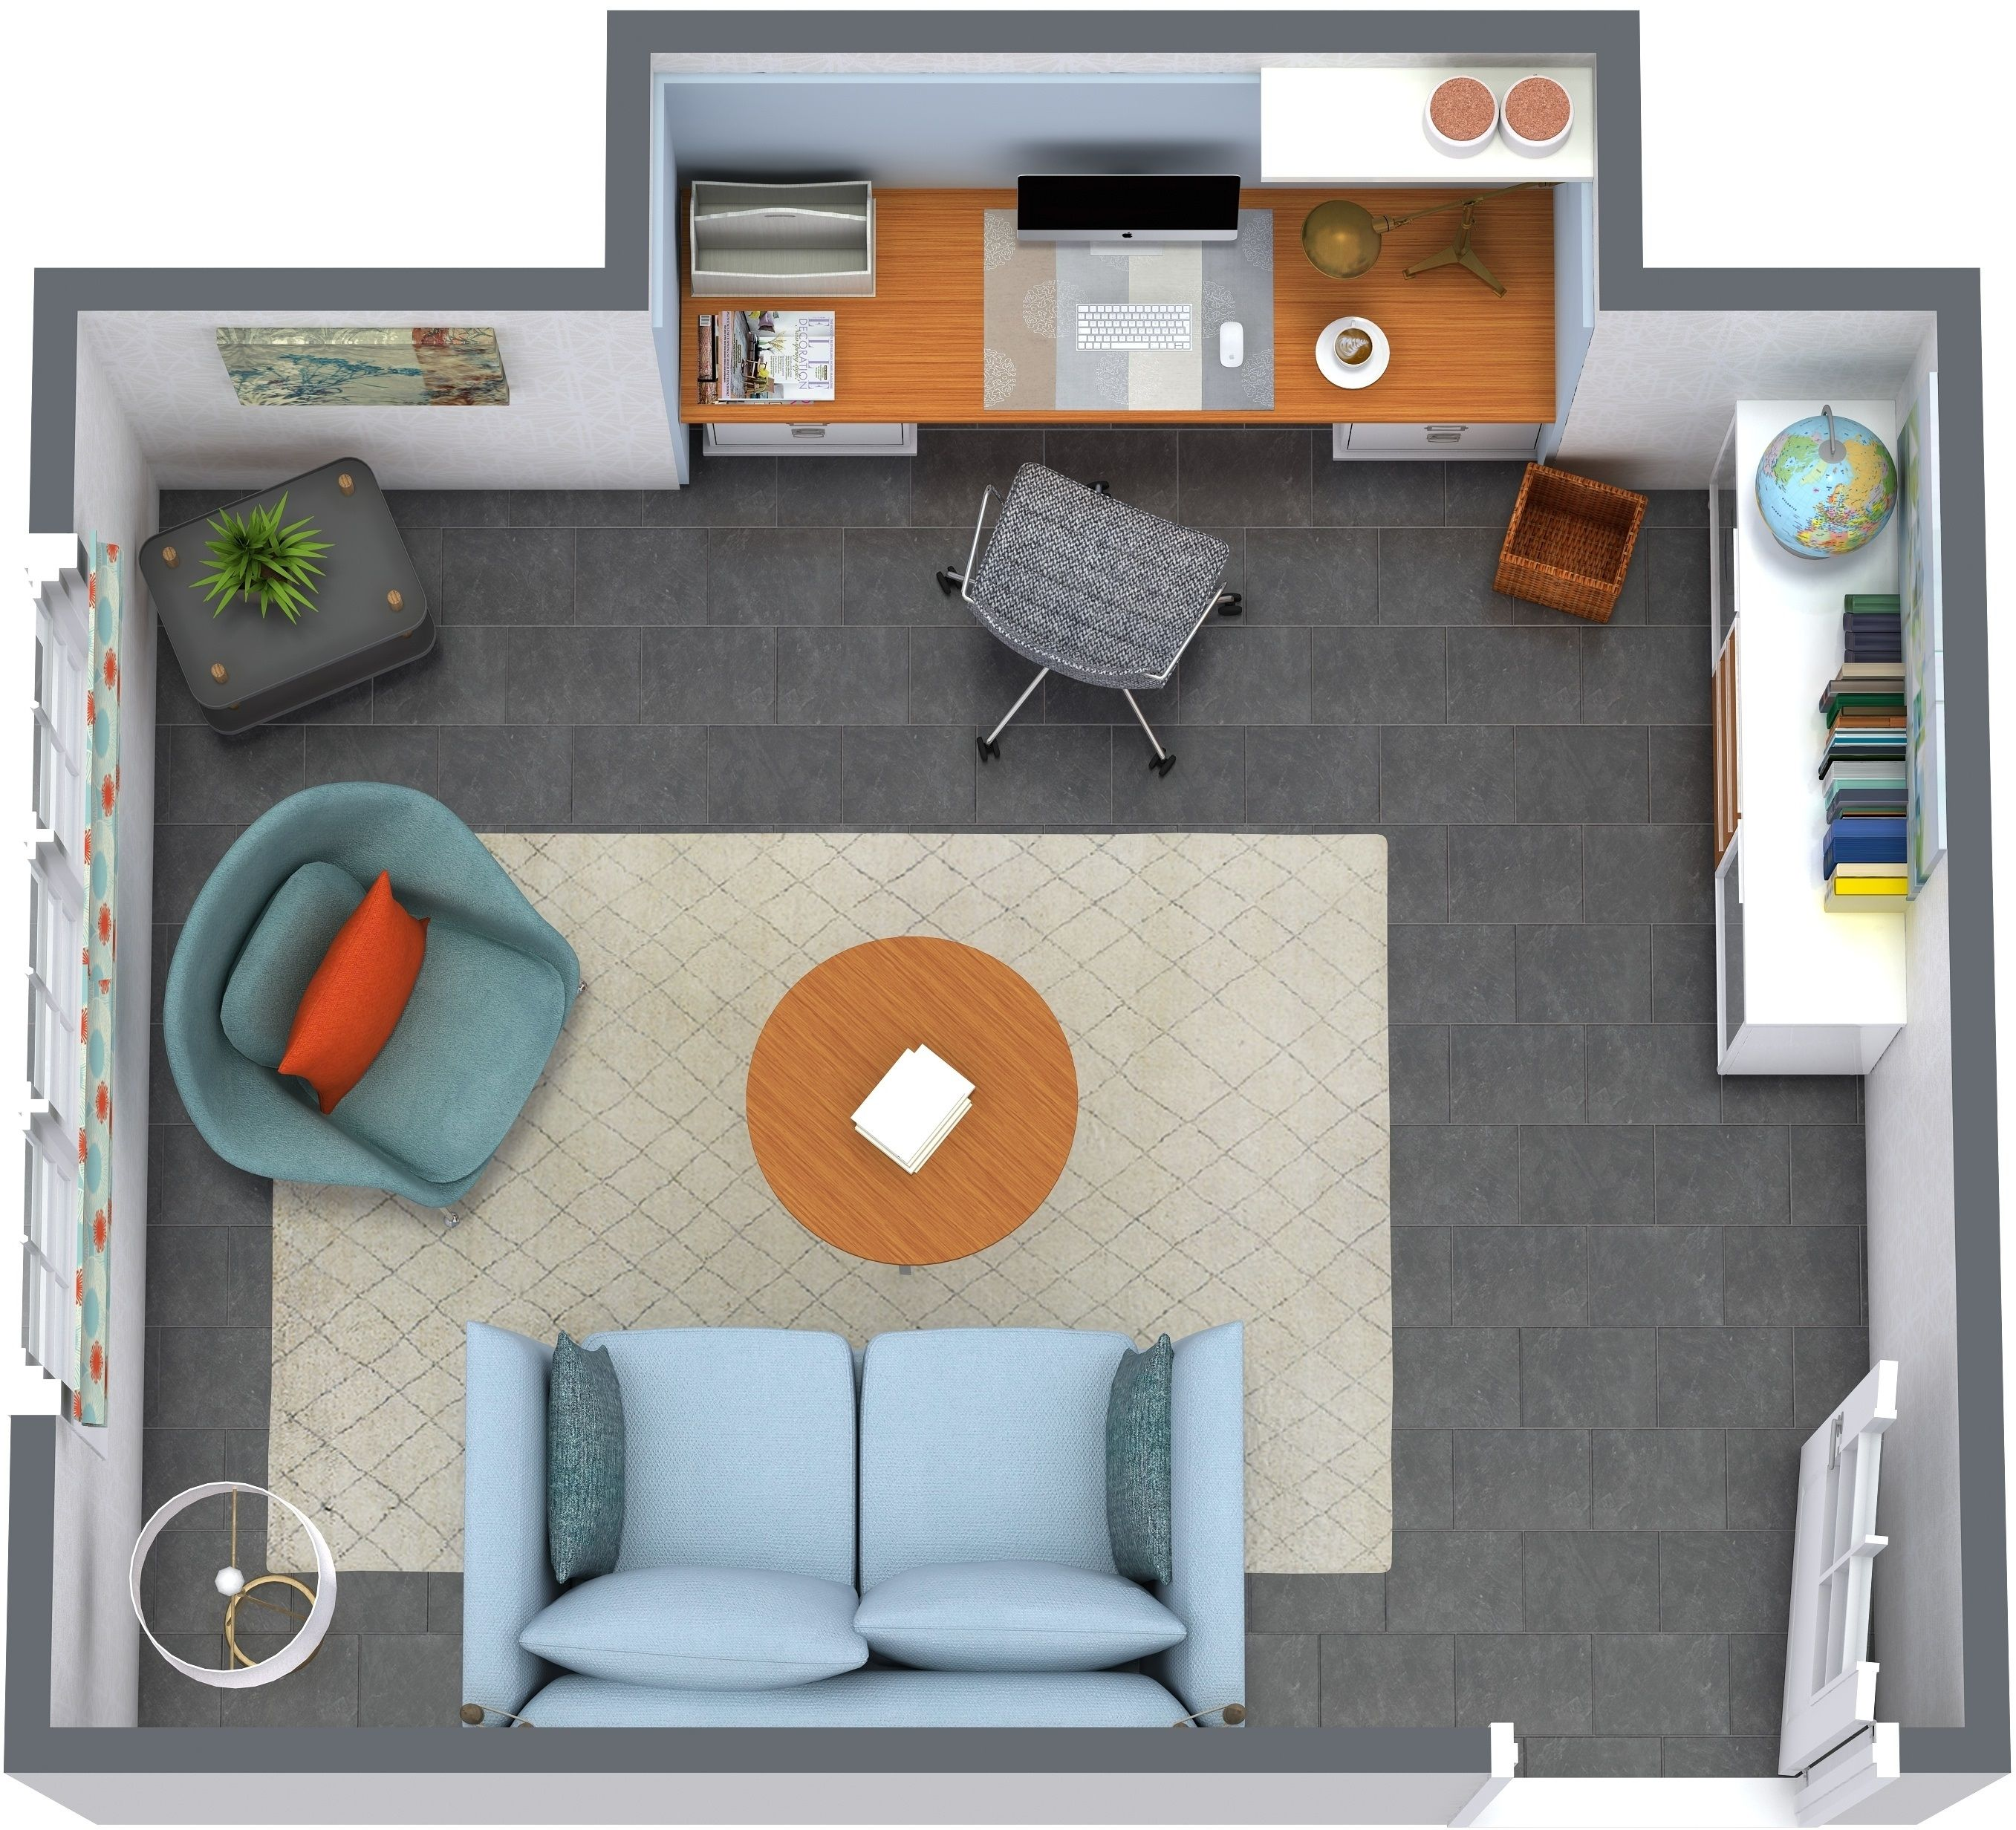 Homeoffice Best Interior Design: Browse More Interior Design Ideas At: Https://artplanat